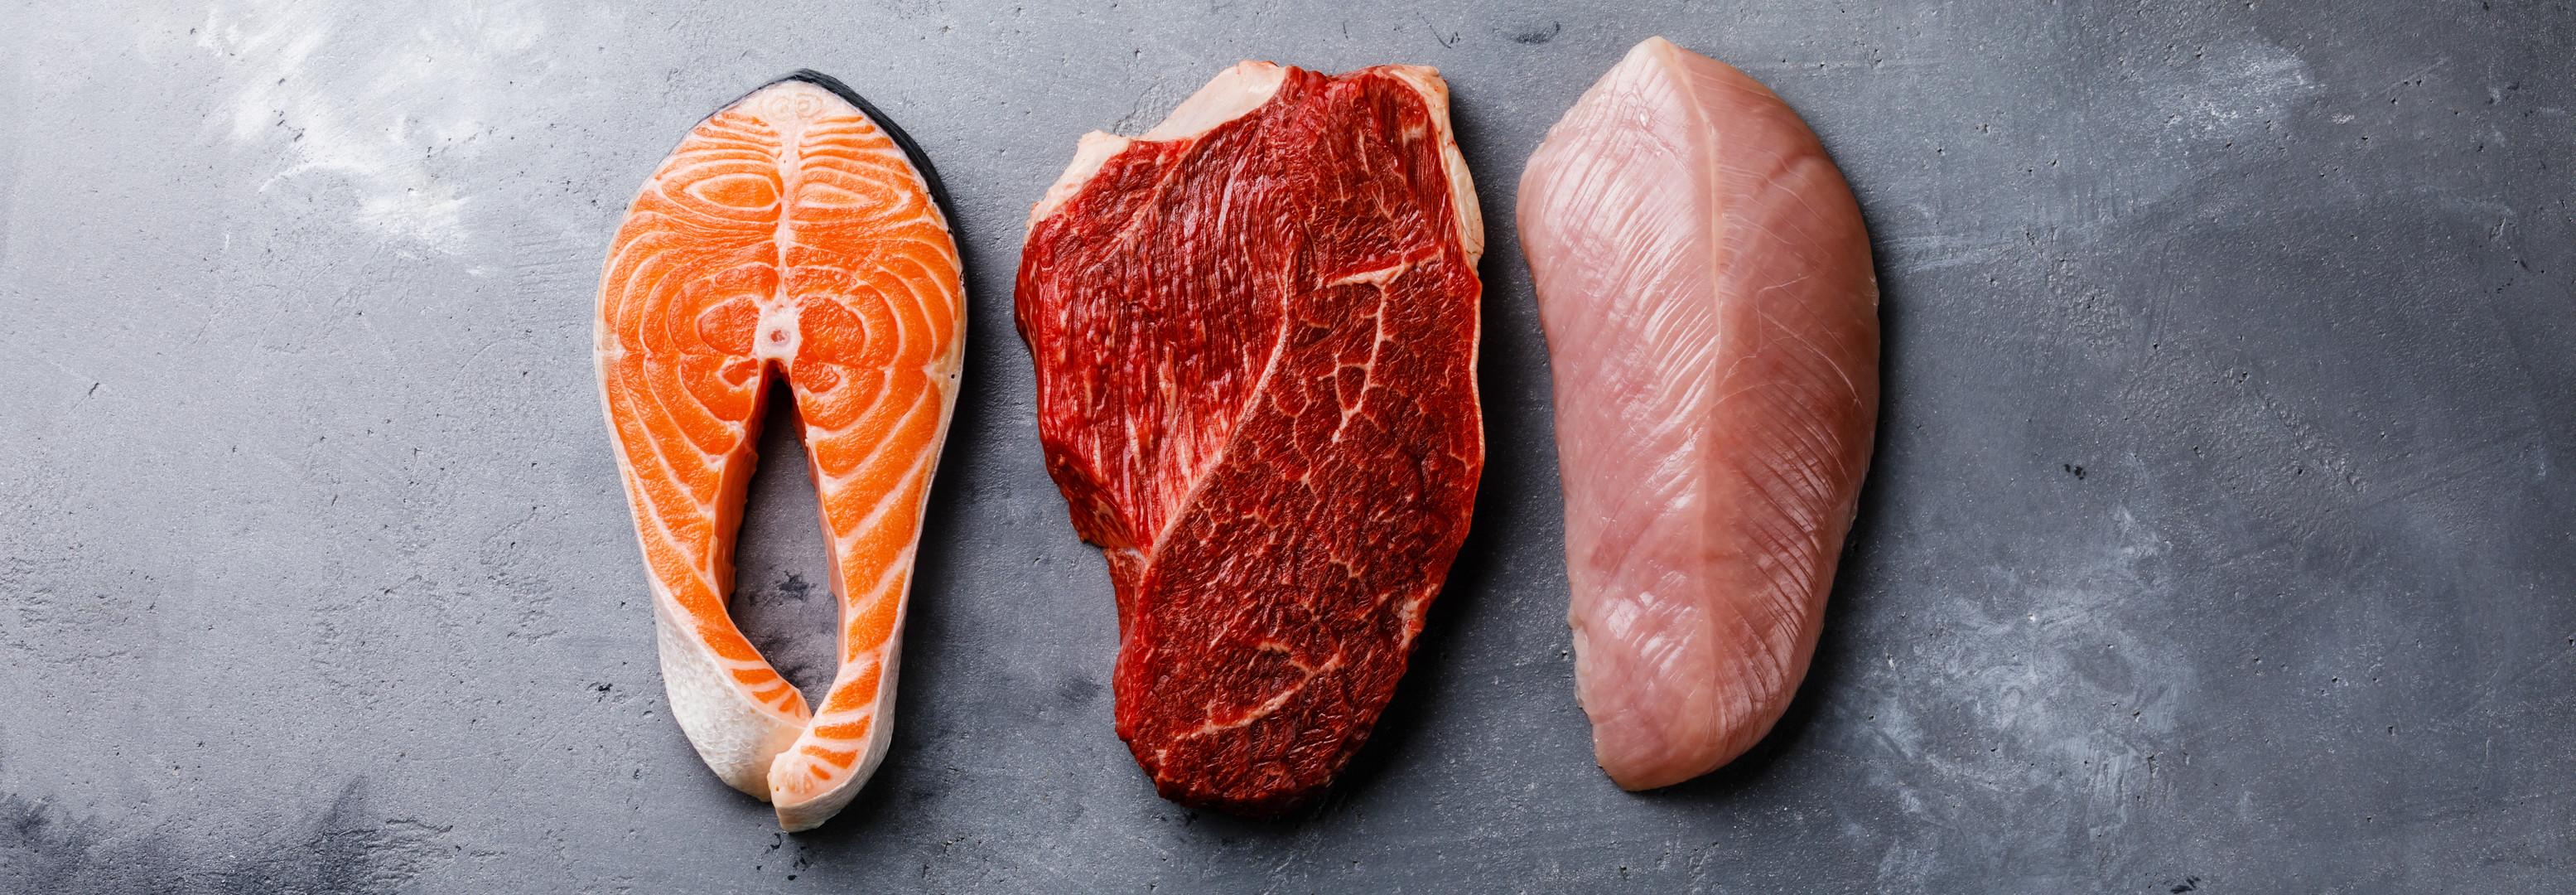 Fresh Fish Meat Poultry.jpg